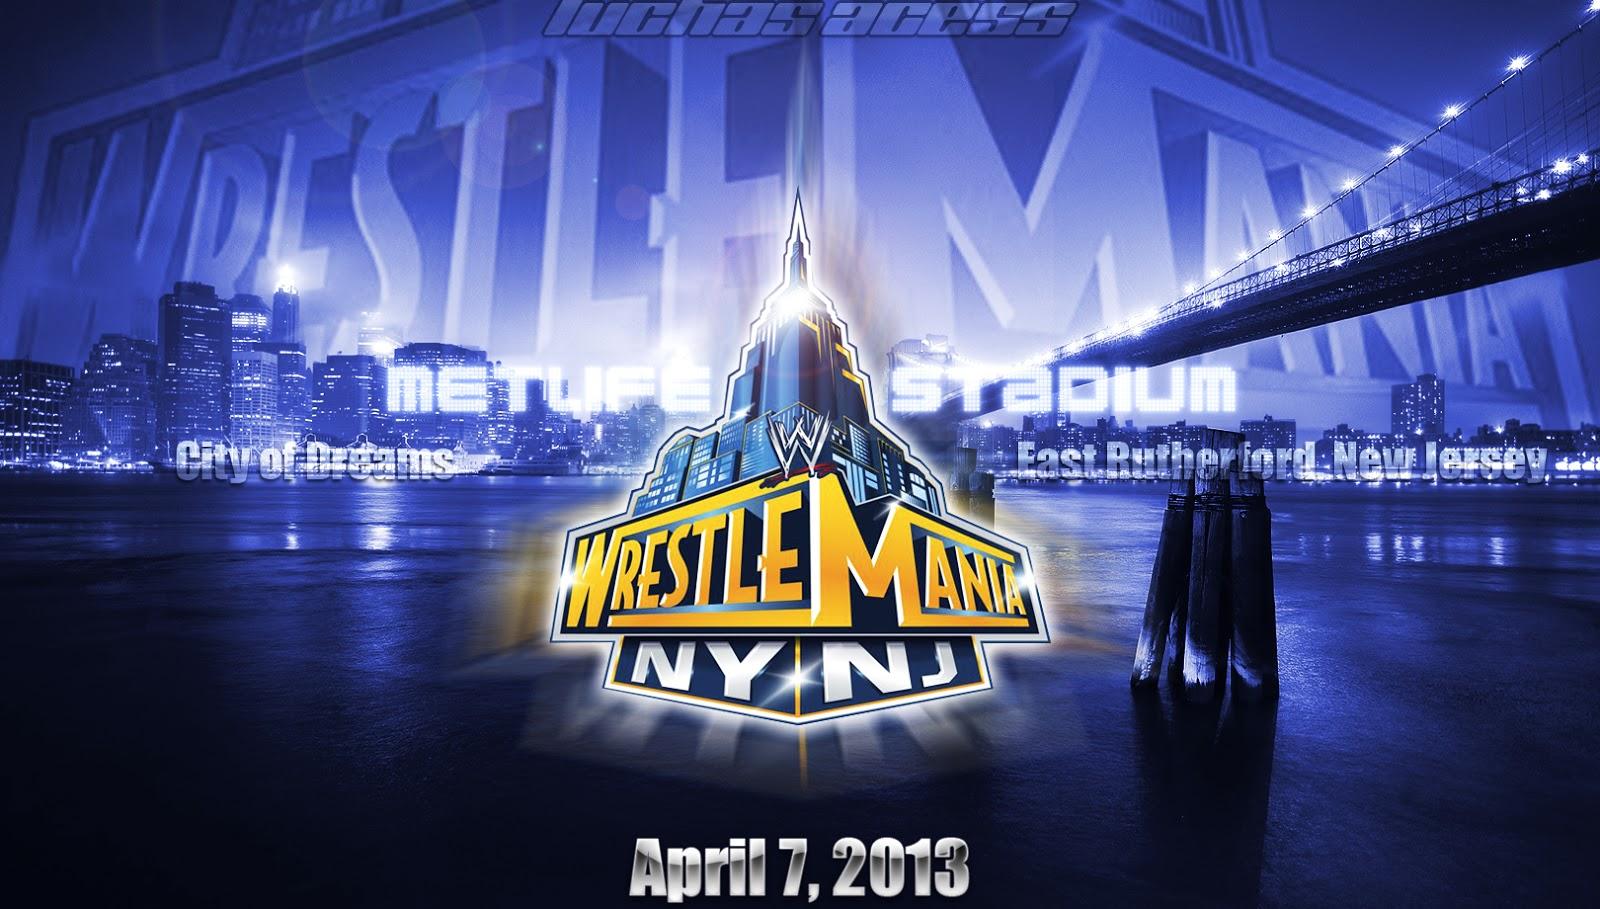 The Undertaker 3d Wallpaper All Wallpapers Wwe Wrestlemania 29 Poster 2013